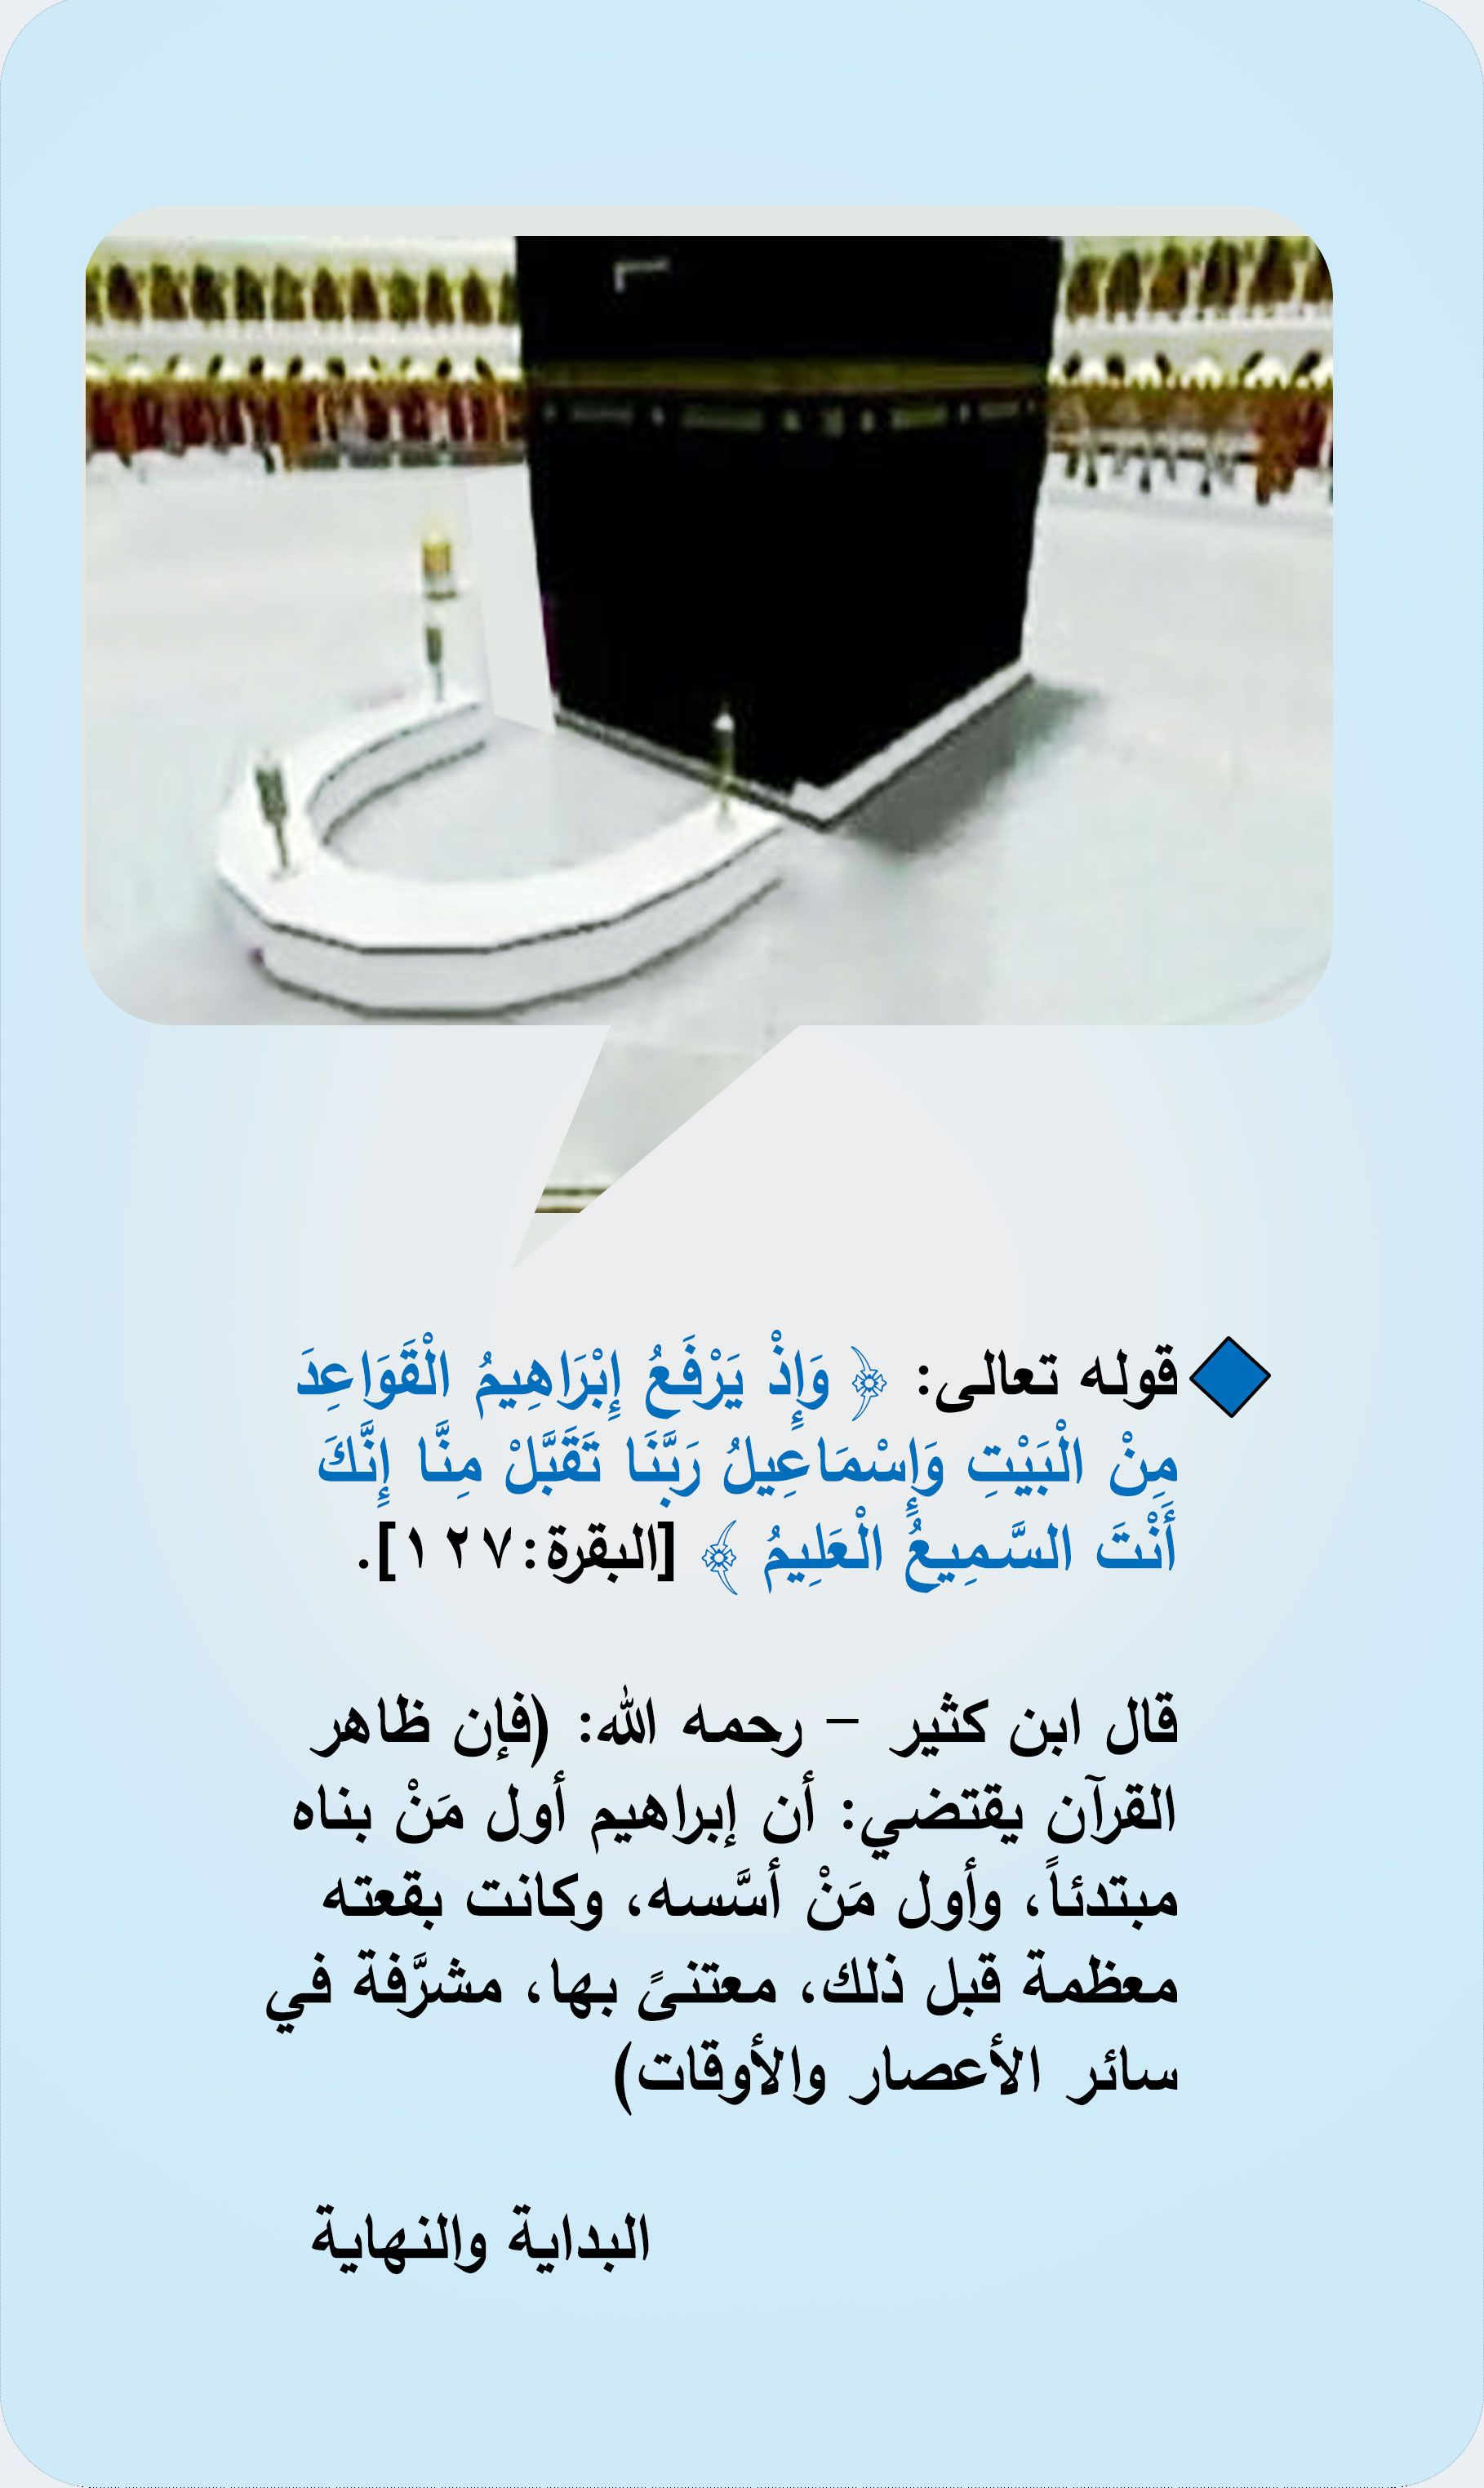 Pin By م شكاهـ On تعظيم شعائر الله الكعبة Shopping